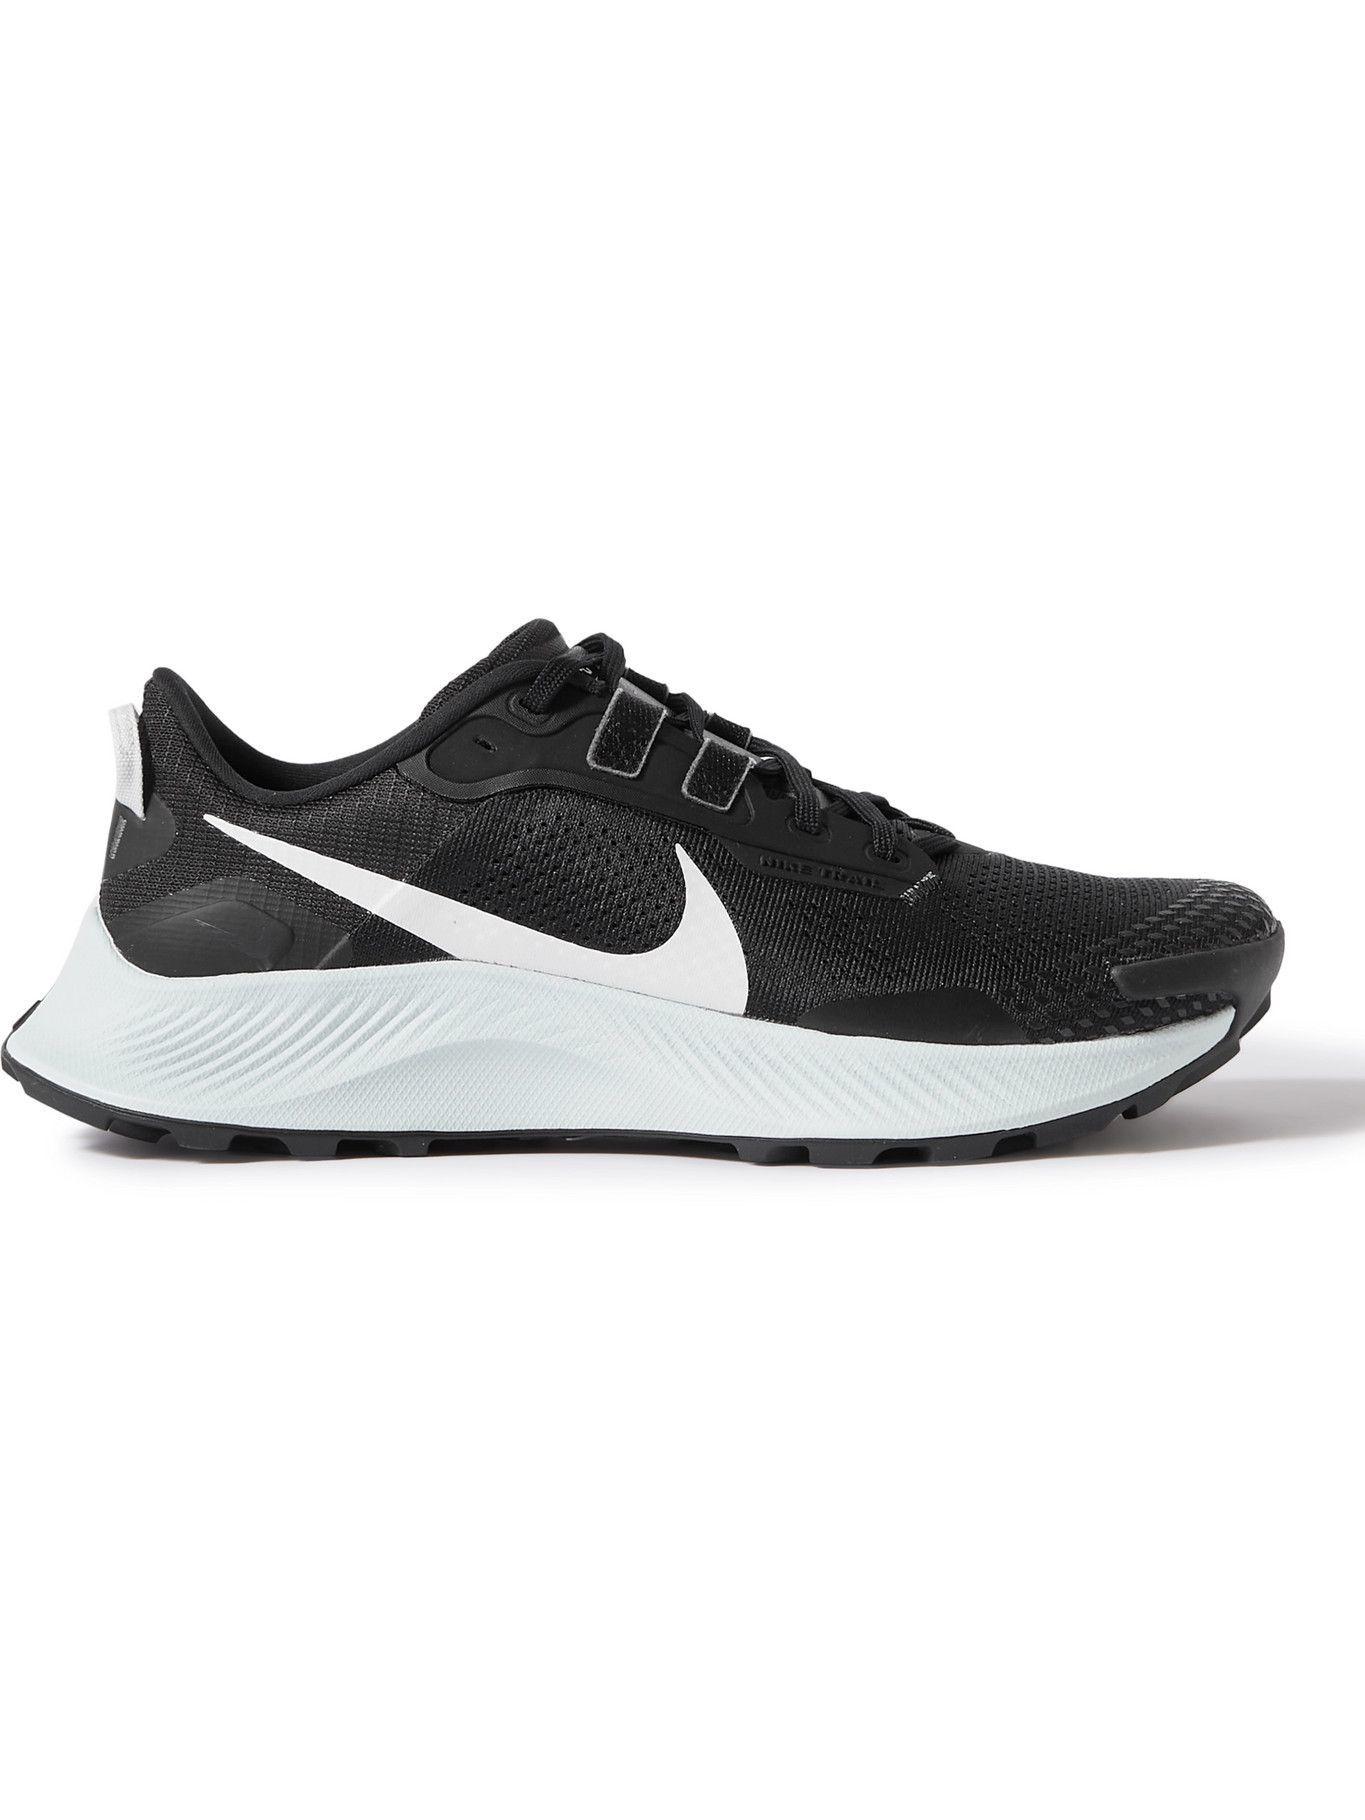 Photo: Nike Running - Pegasus Trail 3 Mesh and Rubber Sneakers - Black